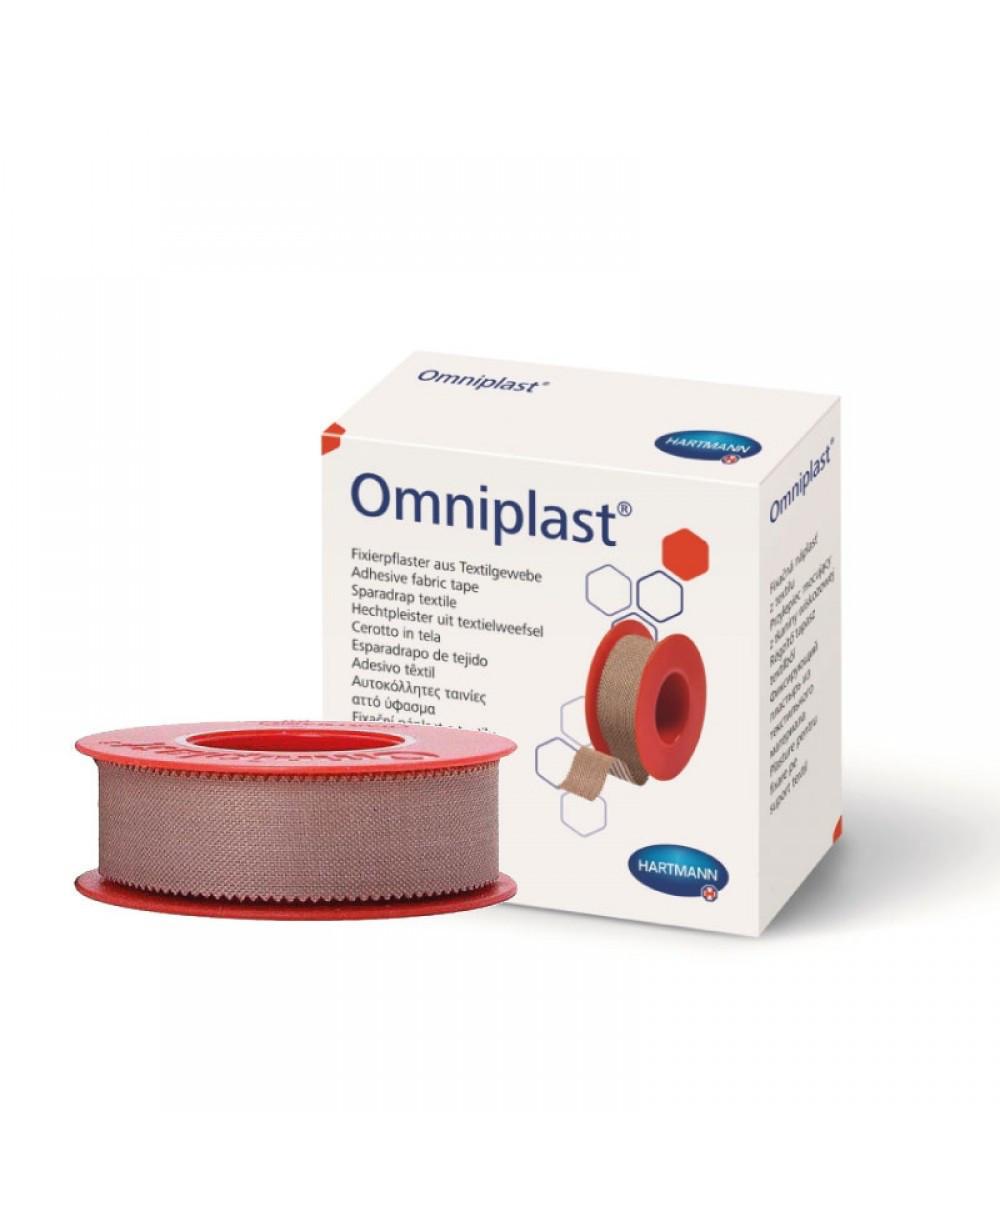 Omniplast / Омнипласт - фиксирующий пластырь из текстильной ткани 1,25 см х 5 м